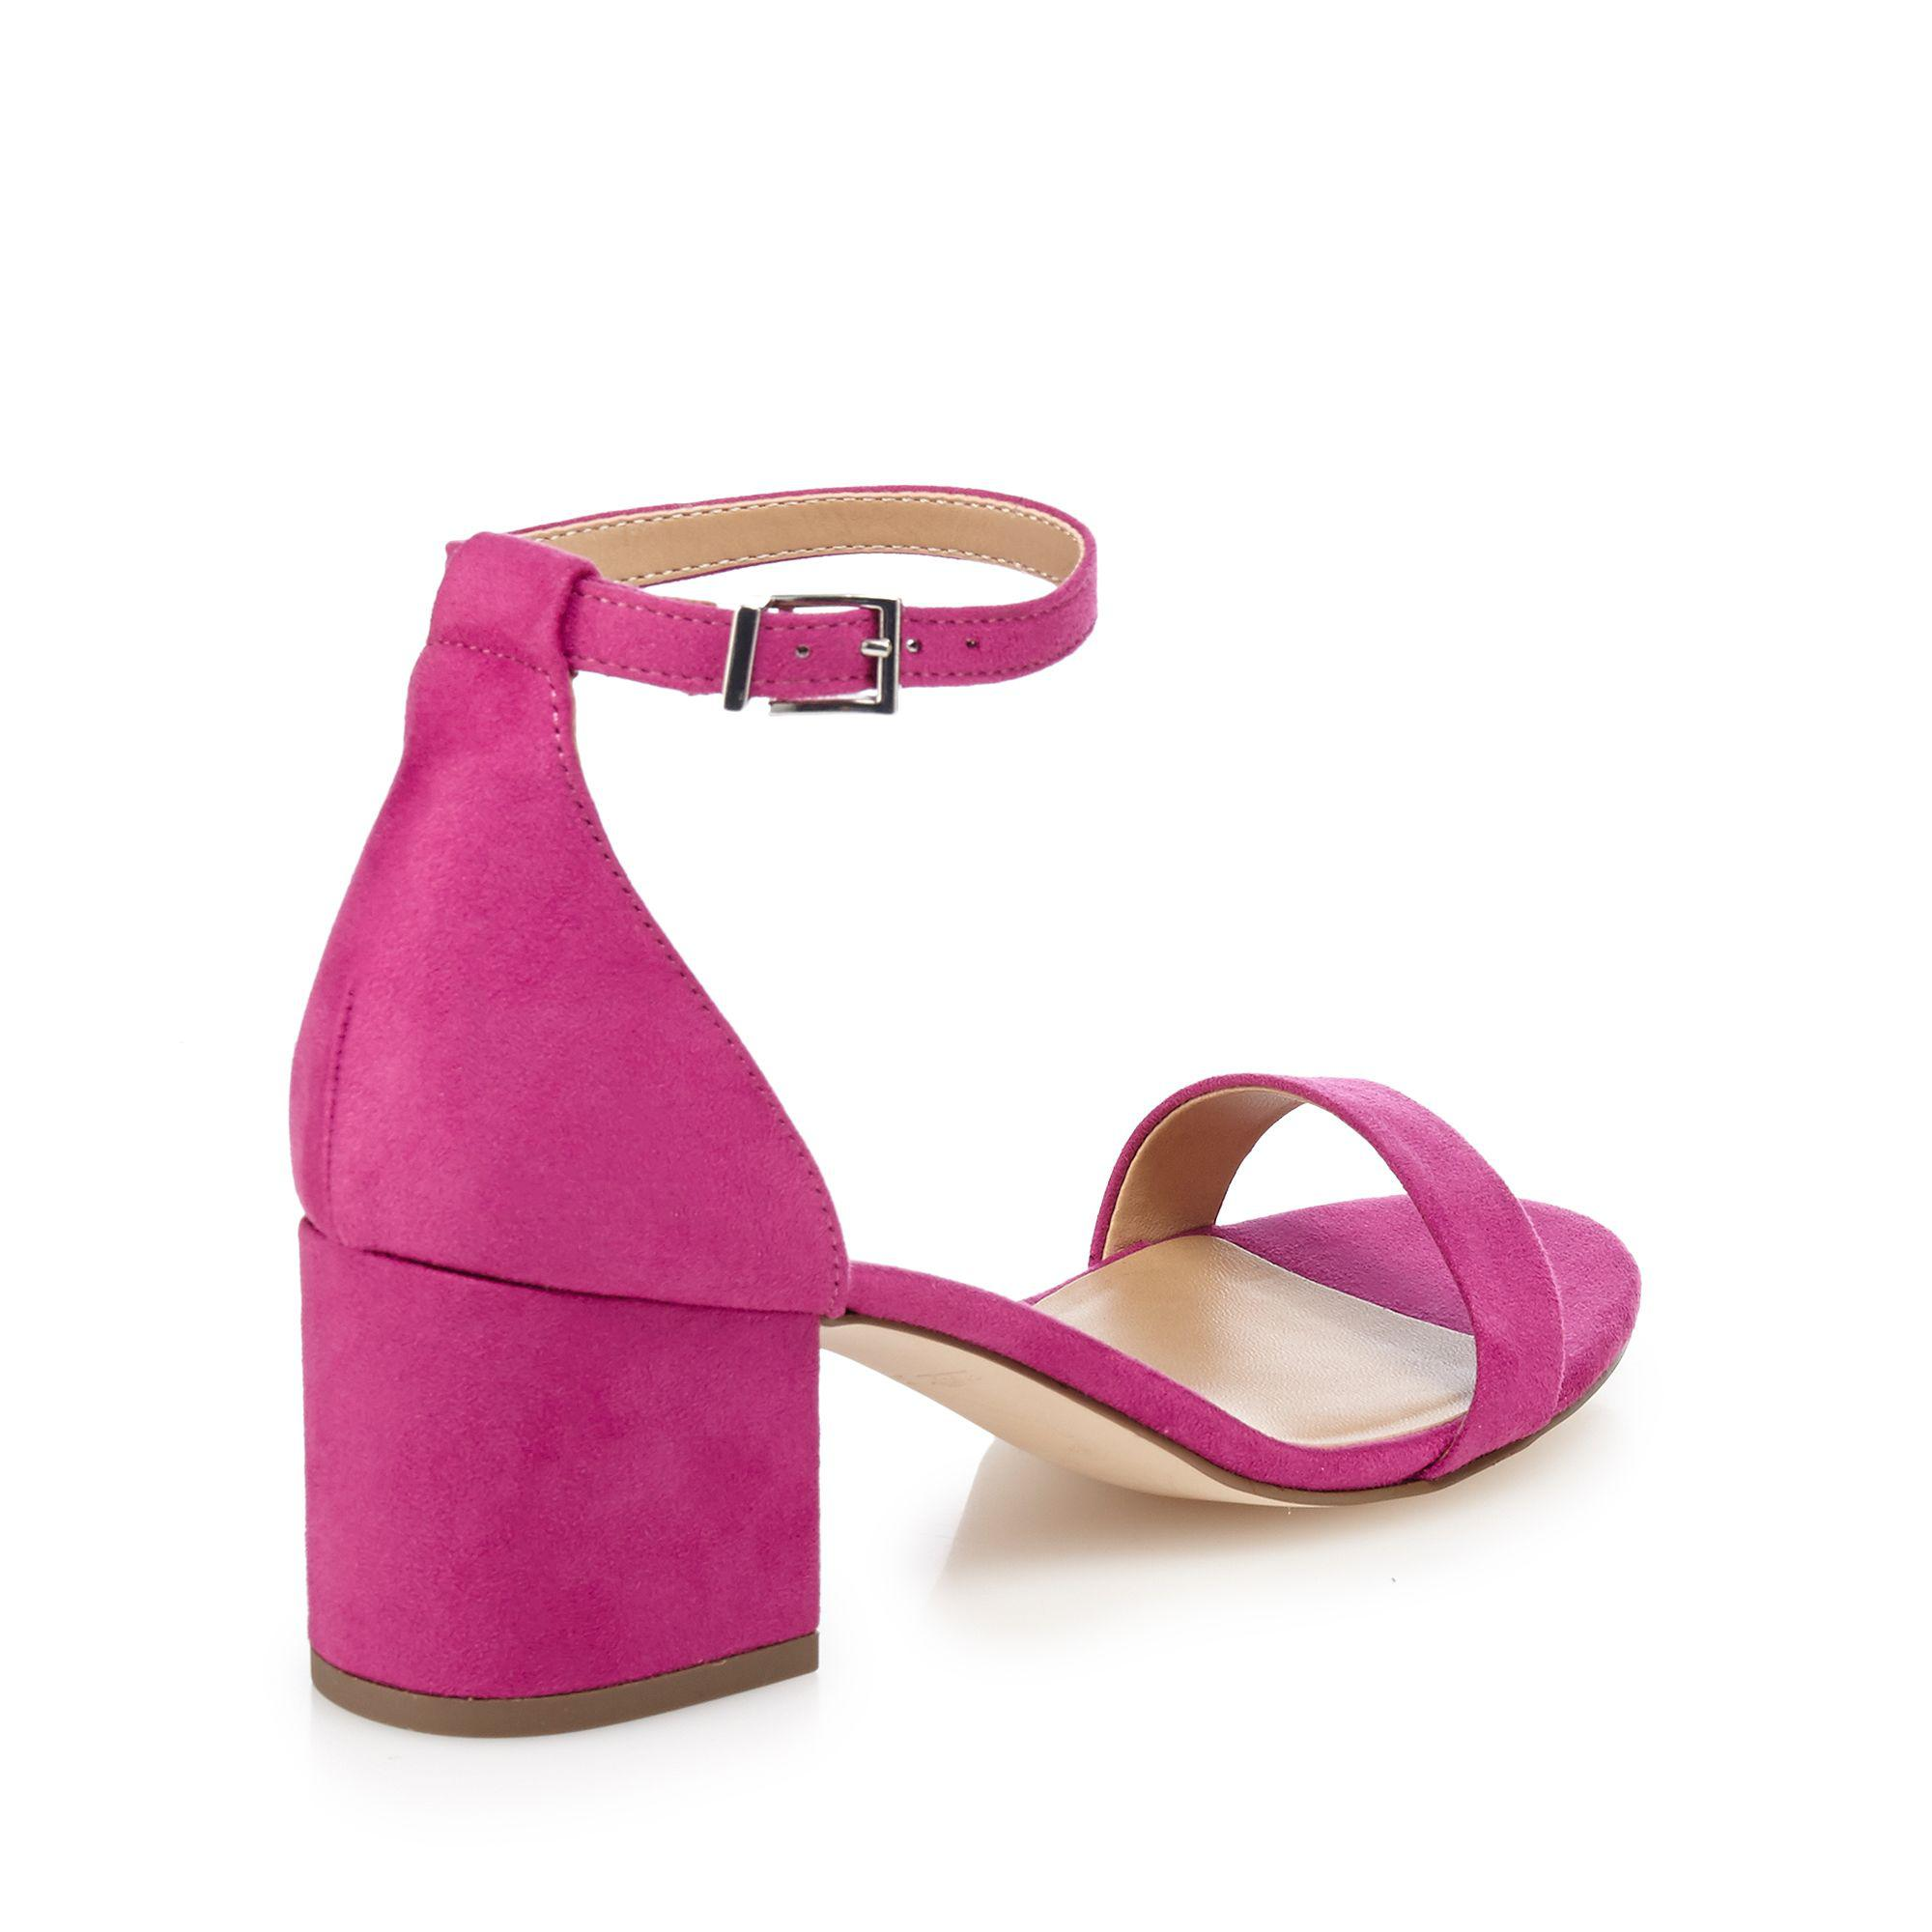 1b8d7ae2cbcf Call It Spring Dark Pink  borewiel  Mid Block Heel Ankle Strap ...